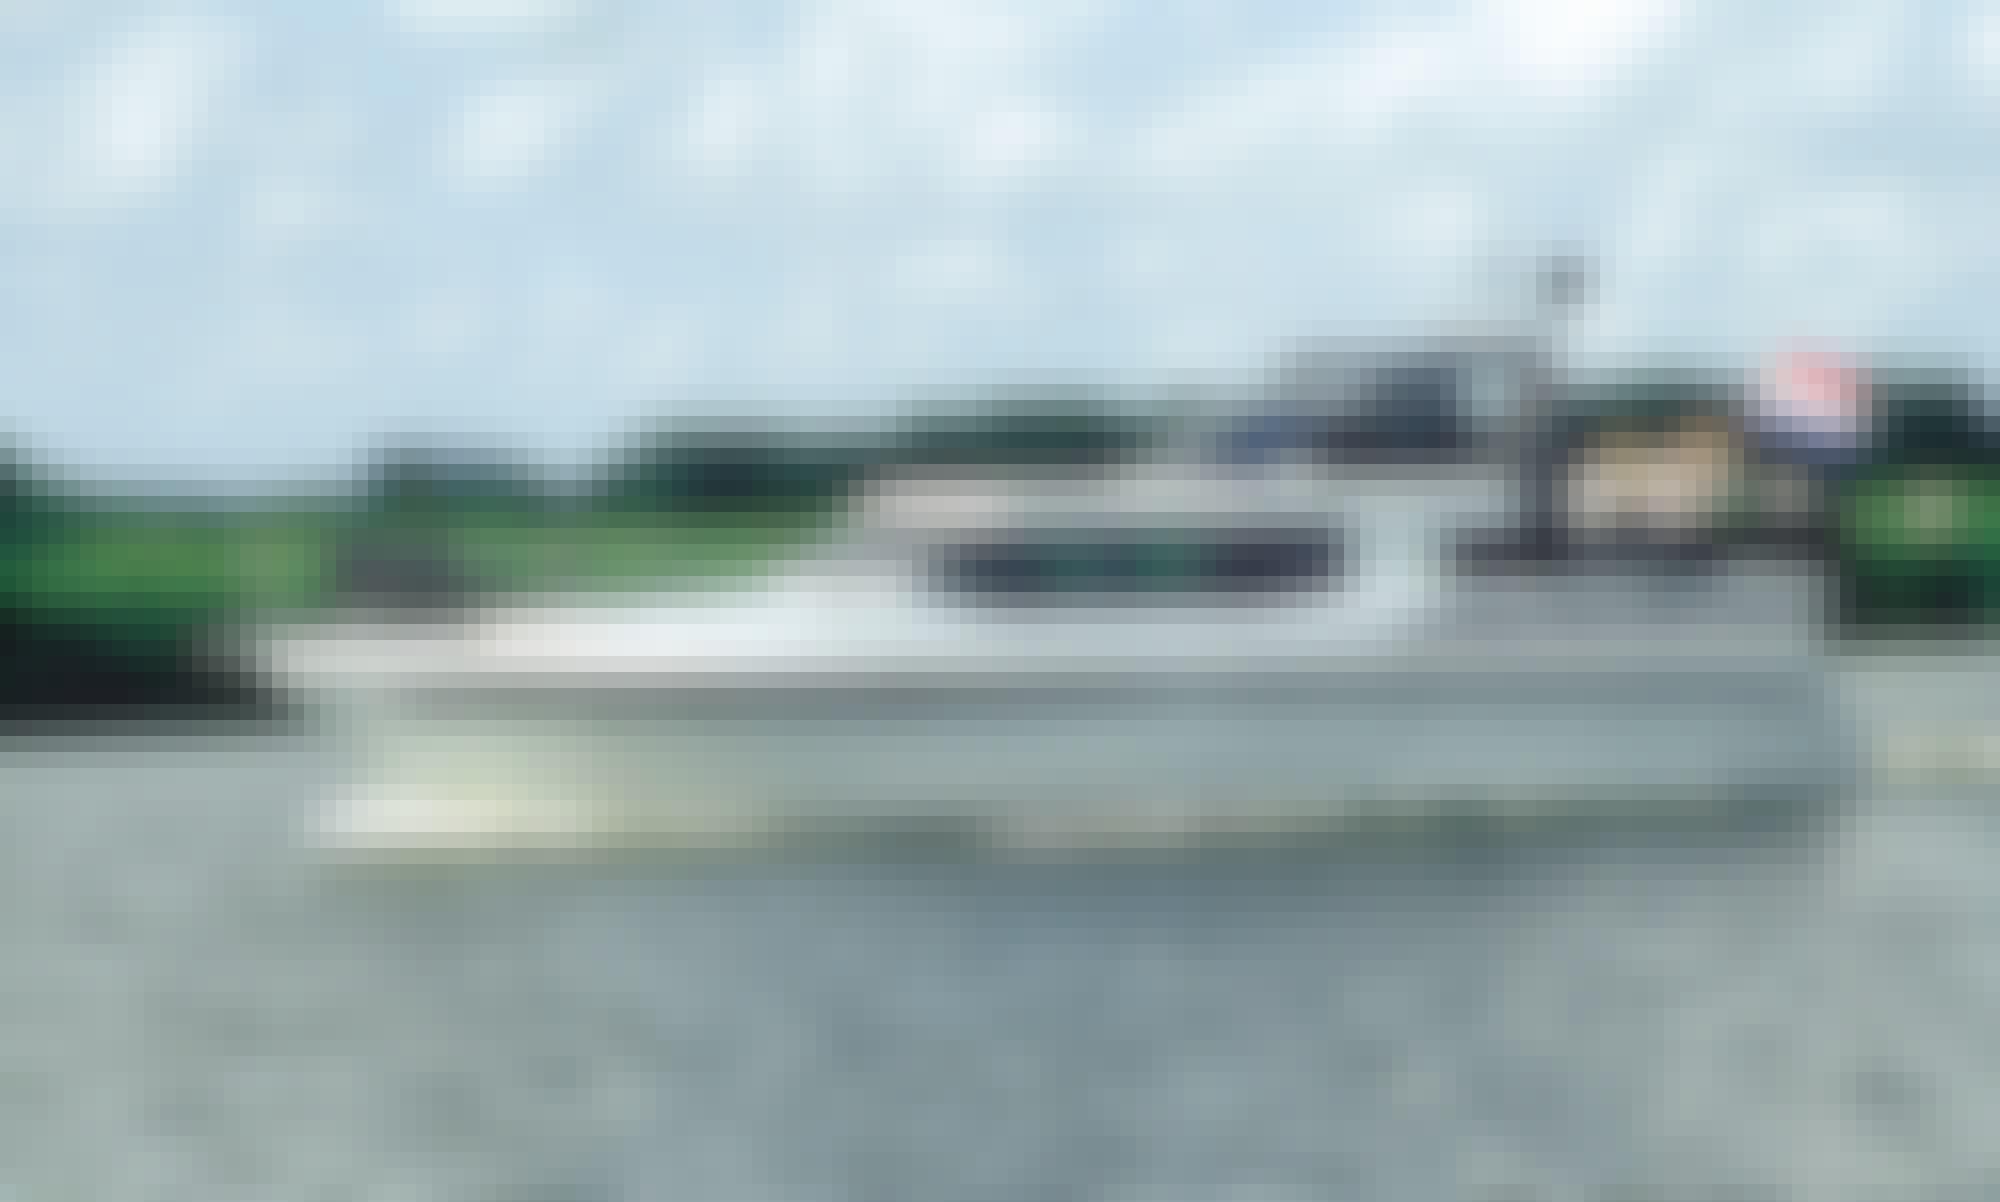 45' Vri-Jon Contessa 1370 Motor Yacht Charter De Drait, Netherlands